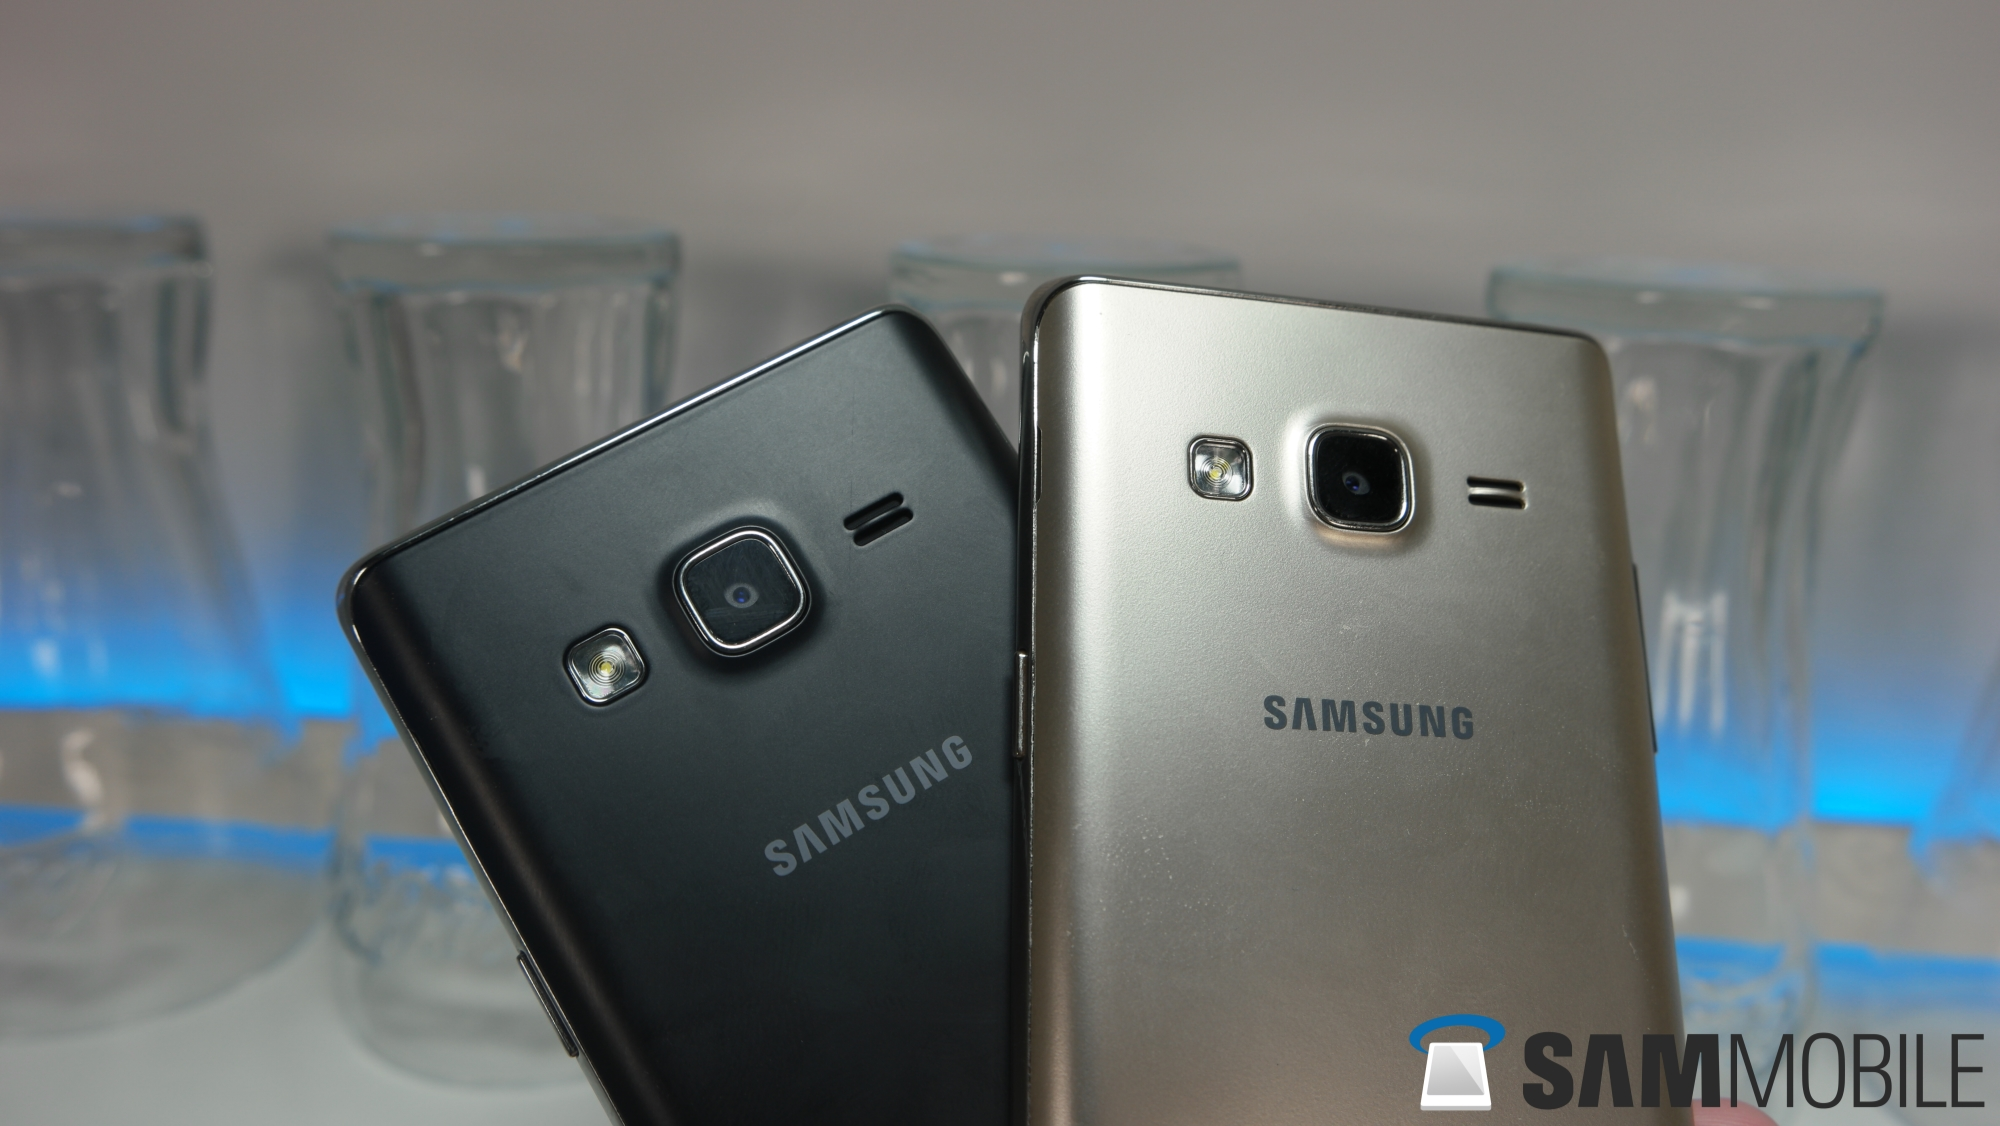 Samsung Z3 Review Tizens App Problem Makes This A Poor Proposition